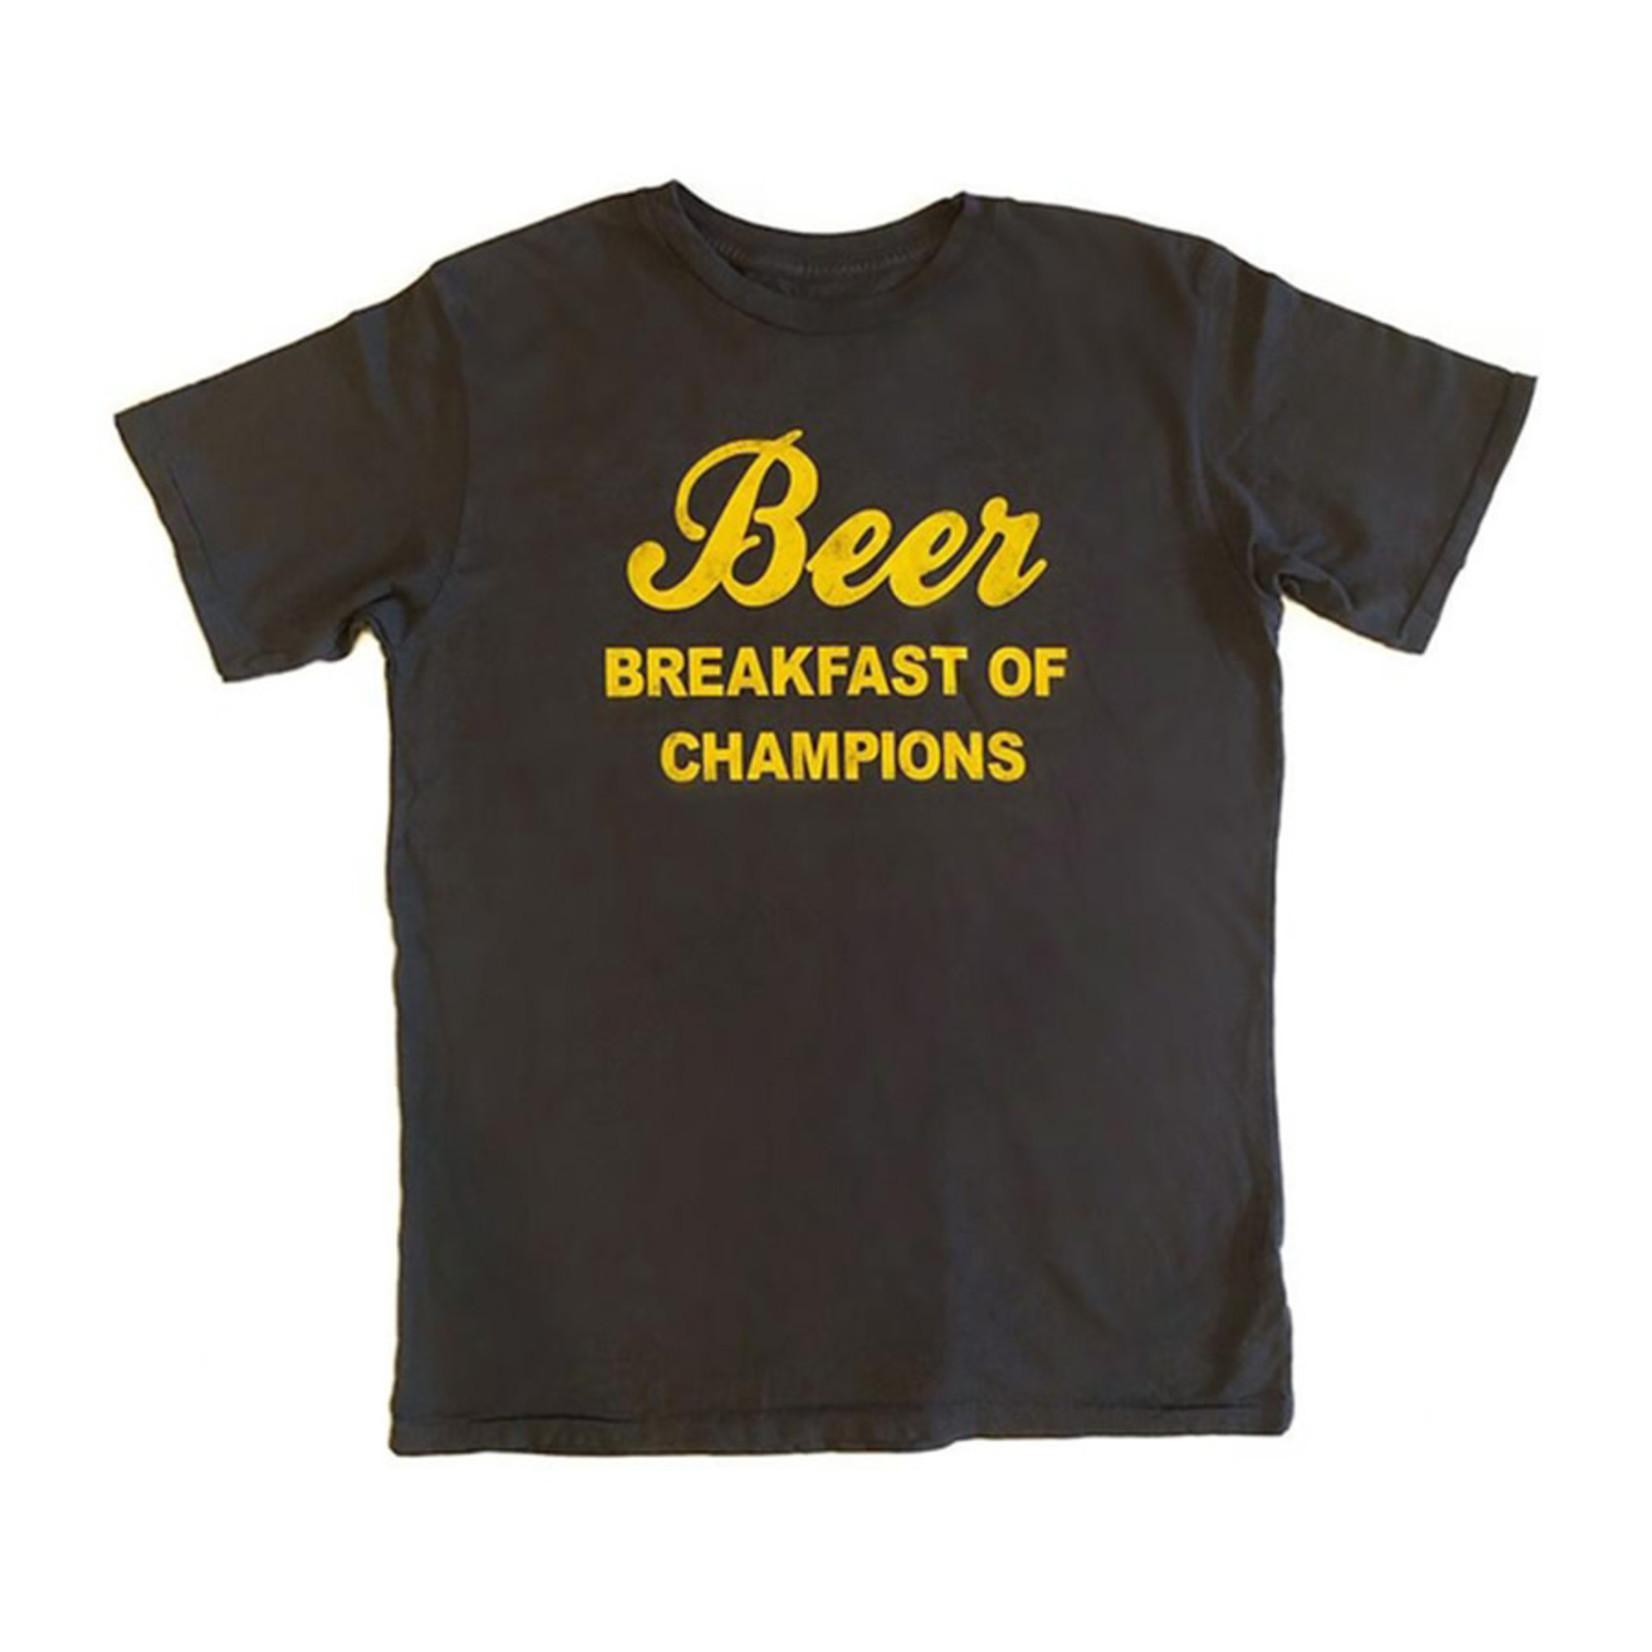 Electric West Beer Breakfast of Champions Tee